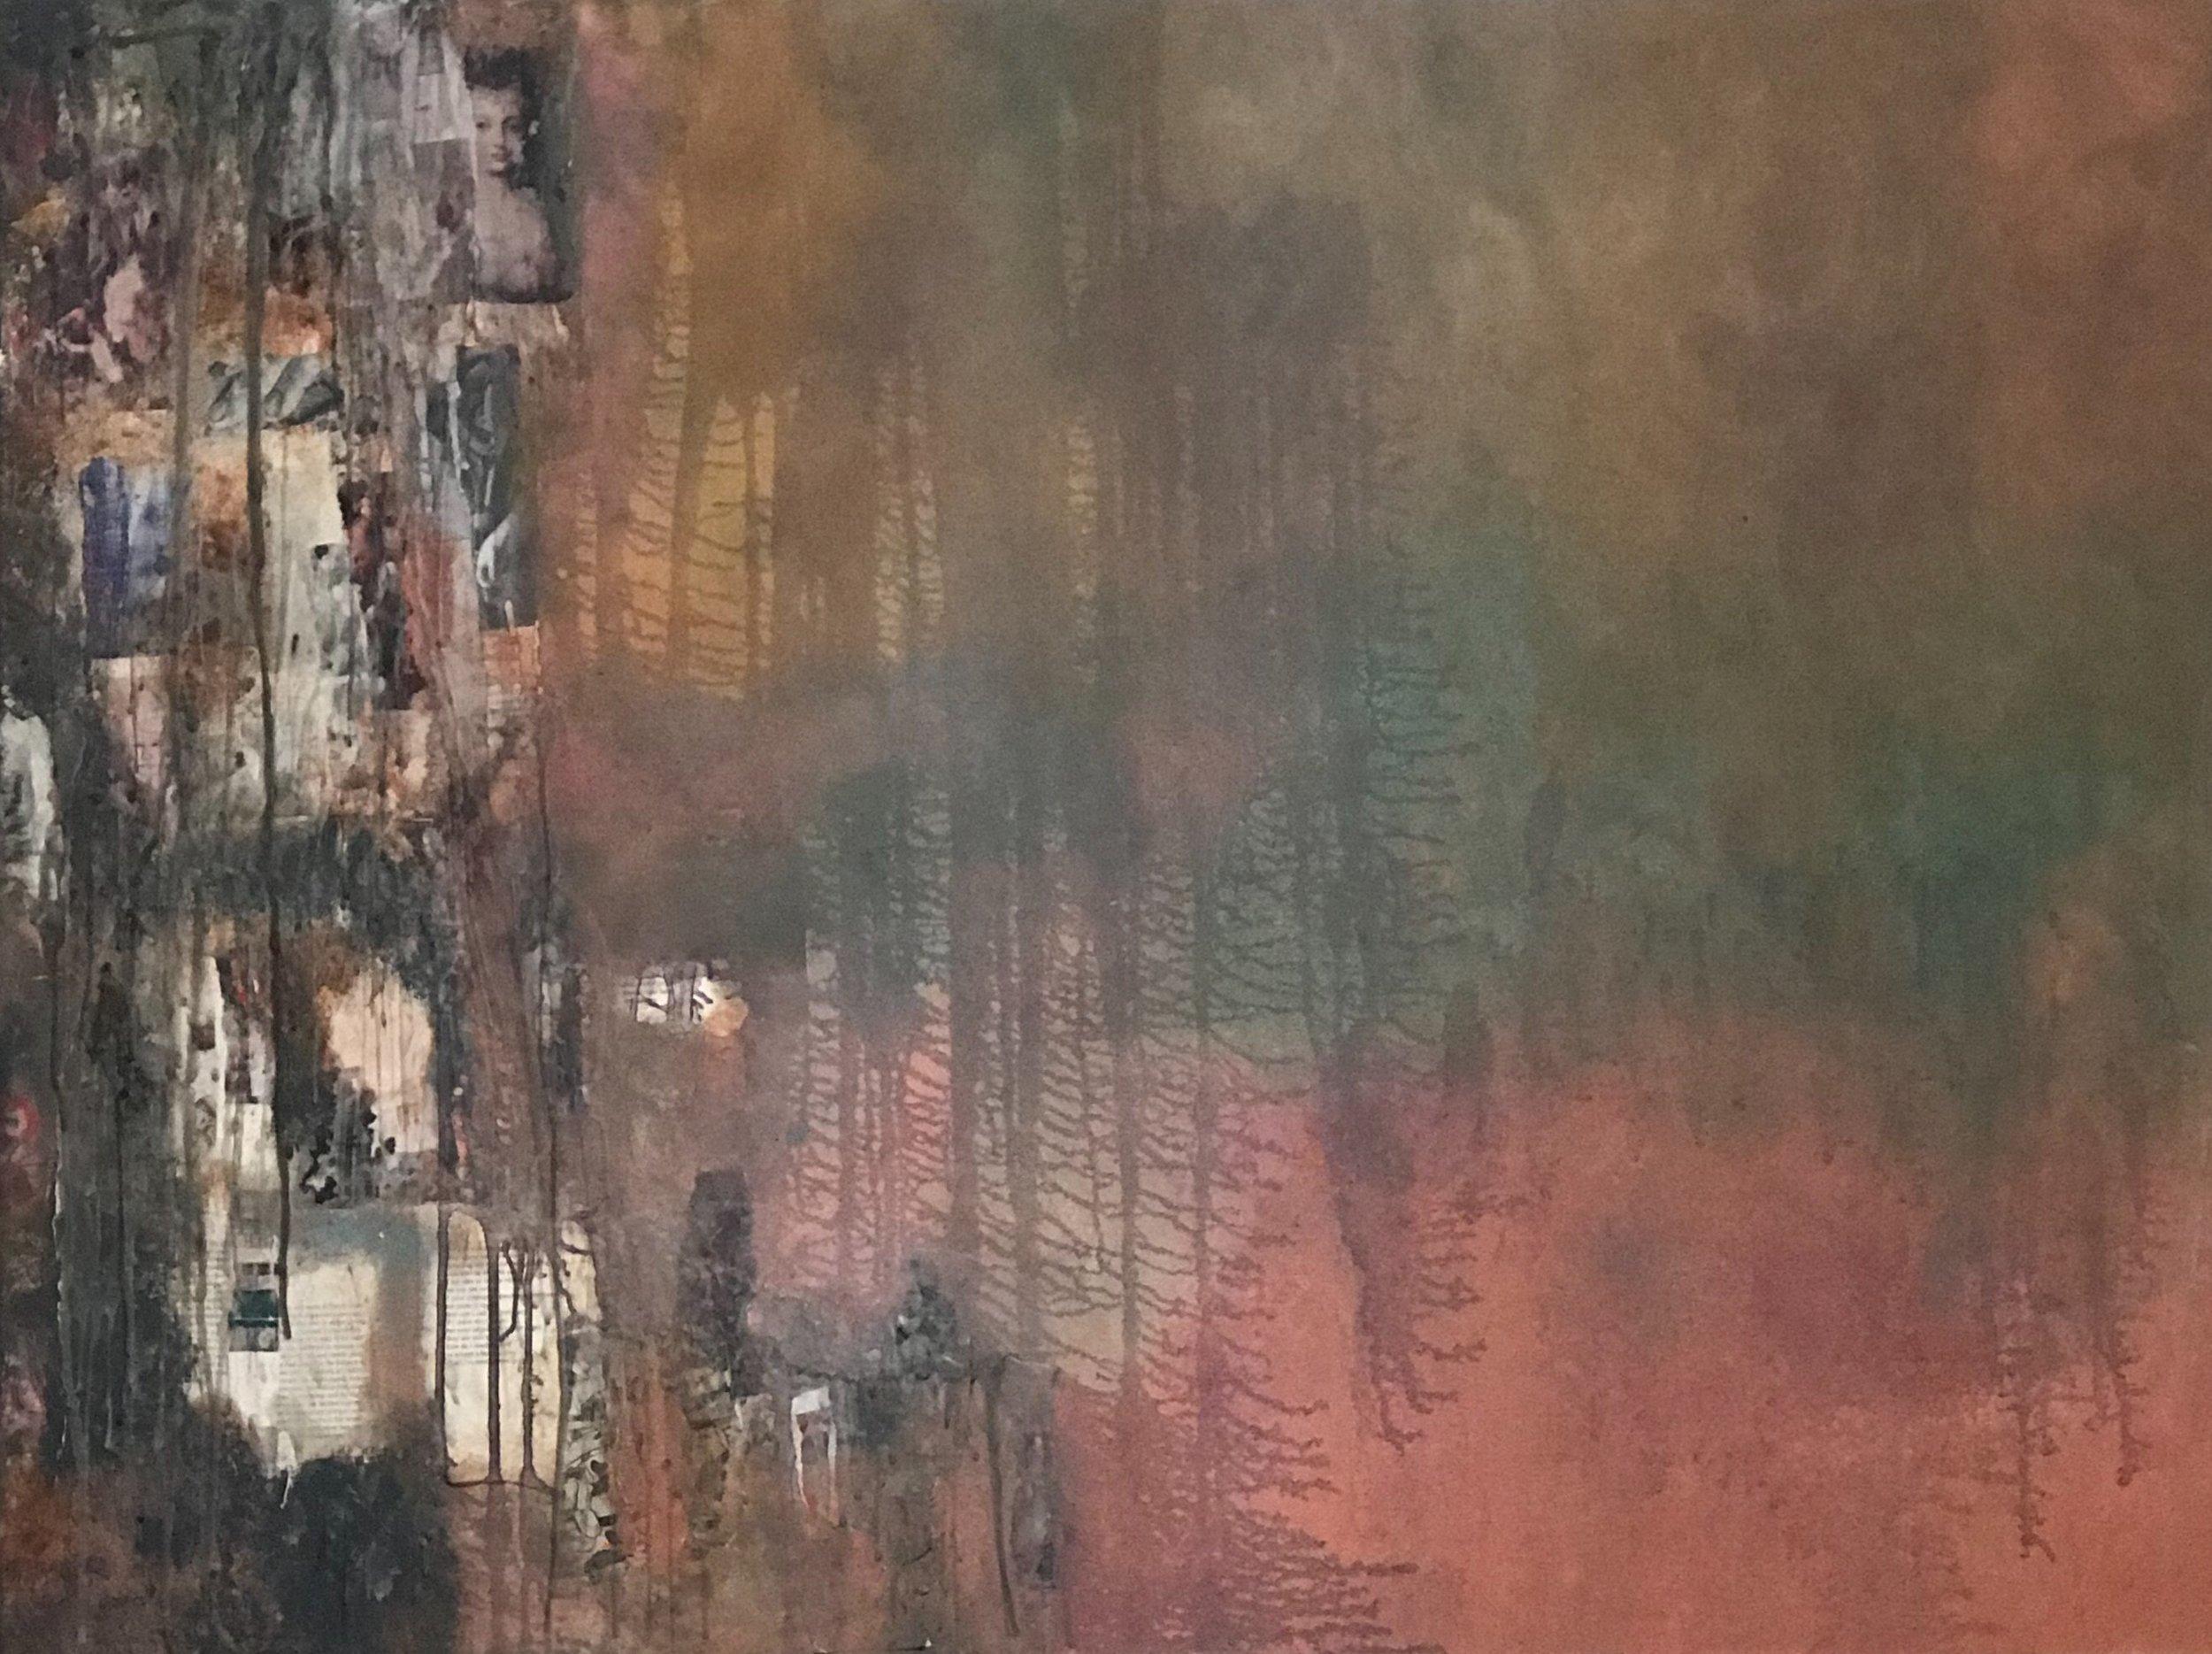 Oil on canvas: 36x48